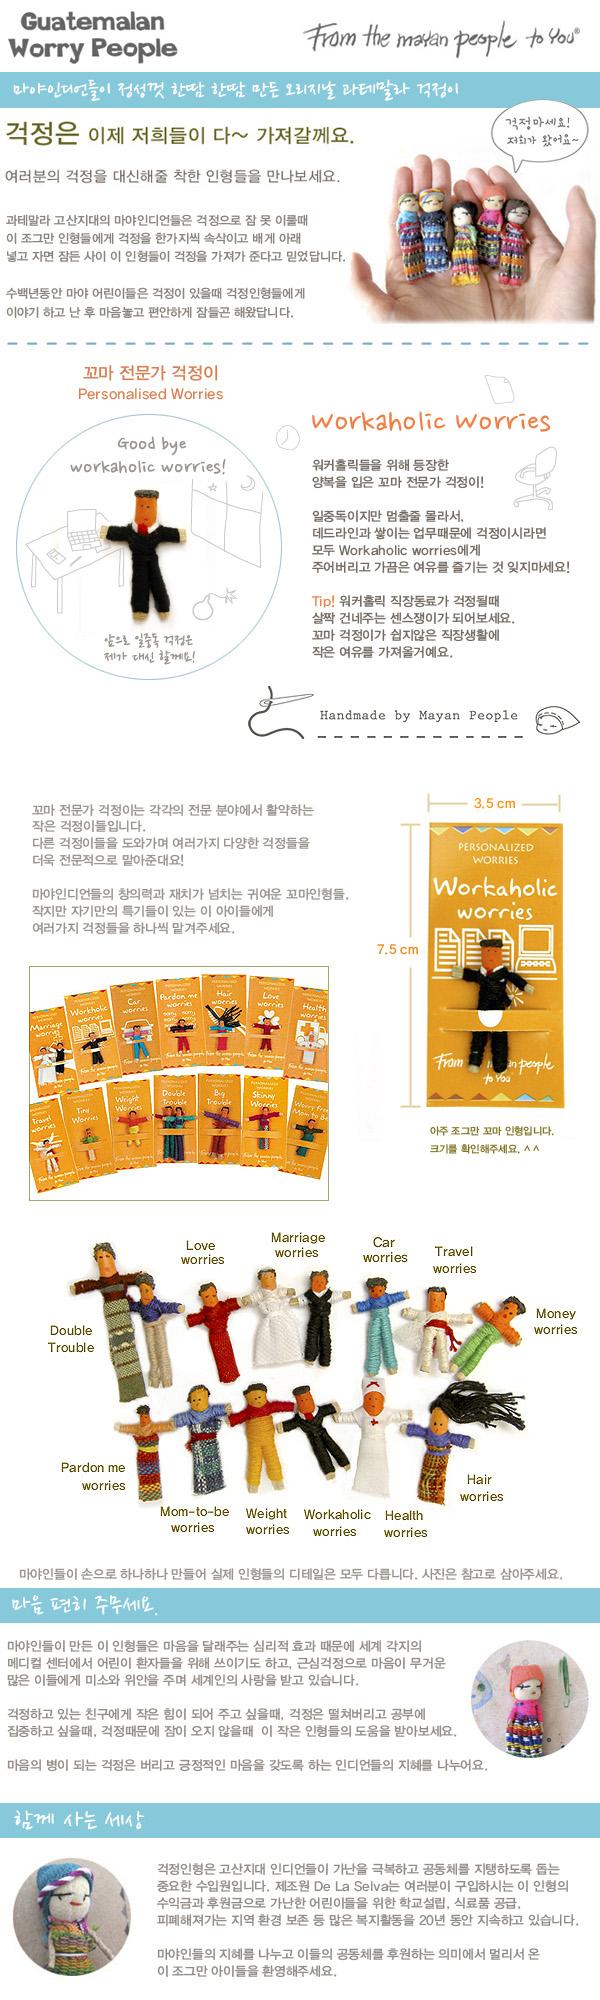 Work Worries 꼬마 전문가 걱정인형 - 워리피플, 1,870원, 걱정인형, 워리피플